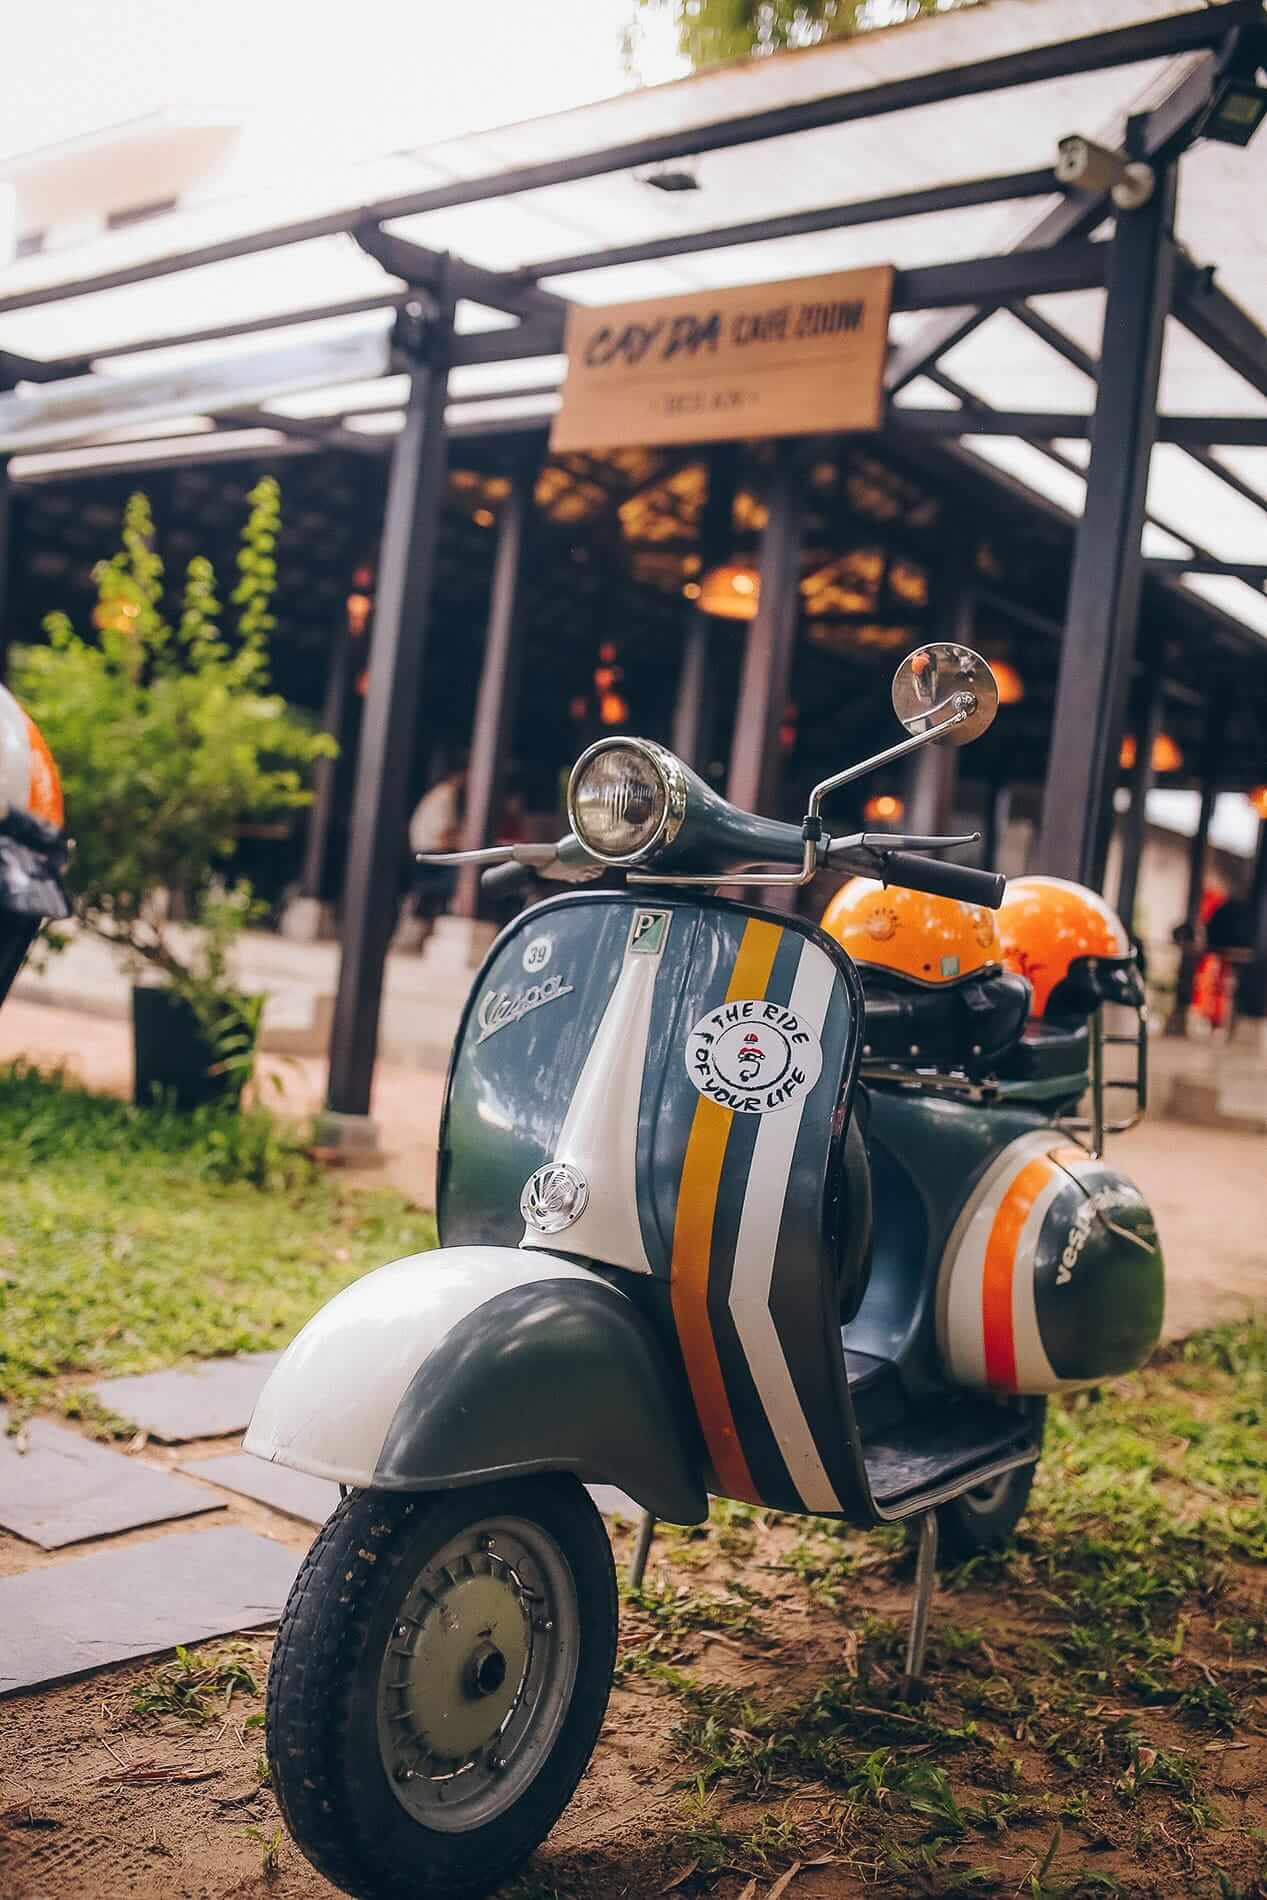 Vespa Adventures scooter